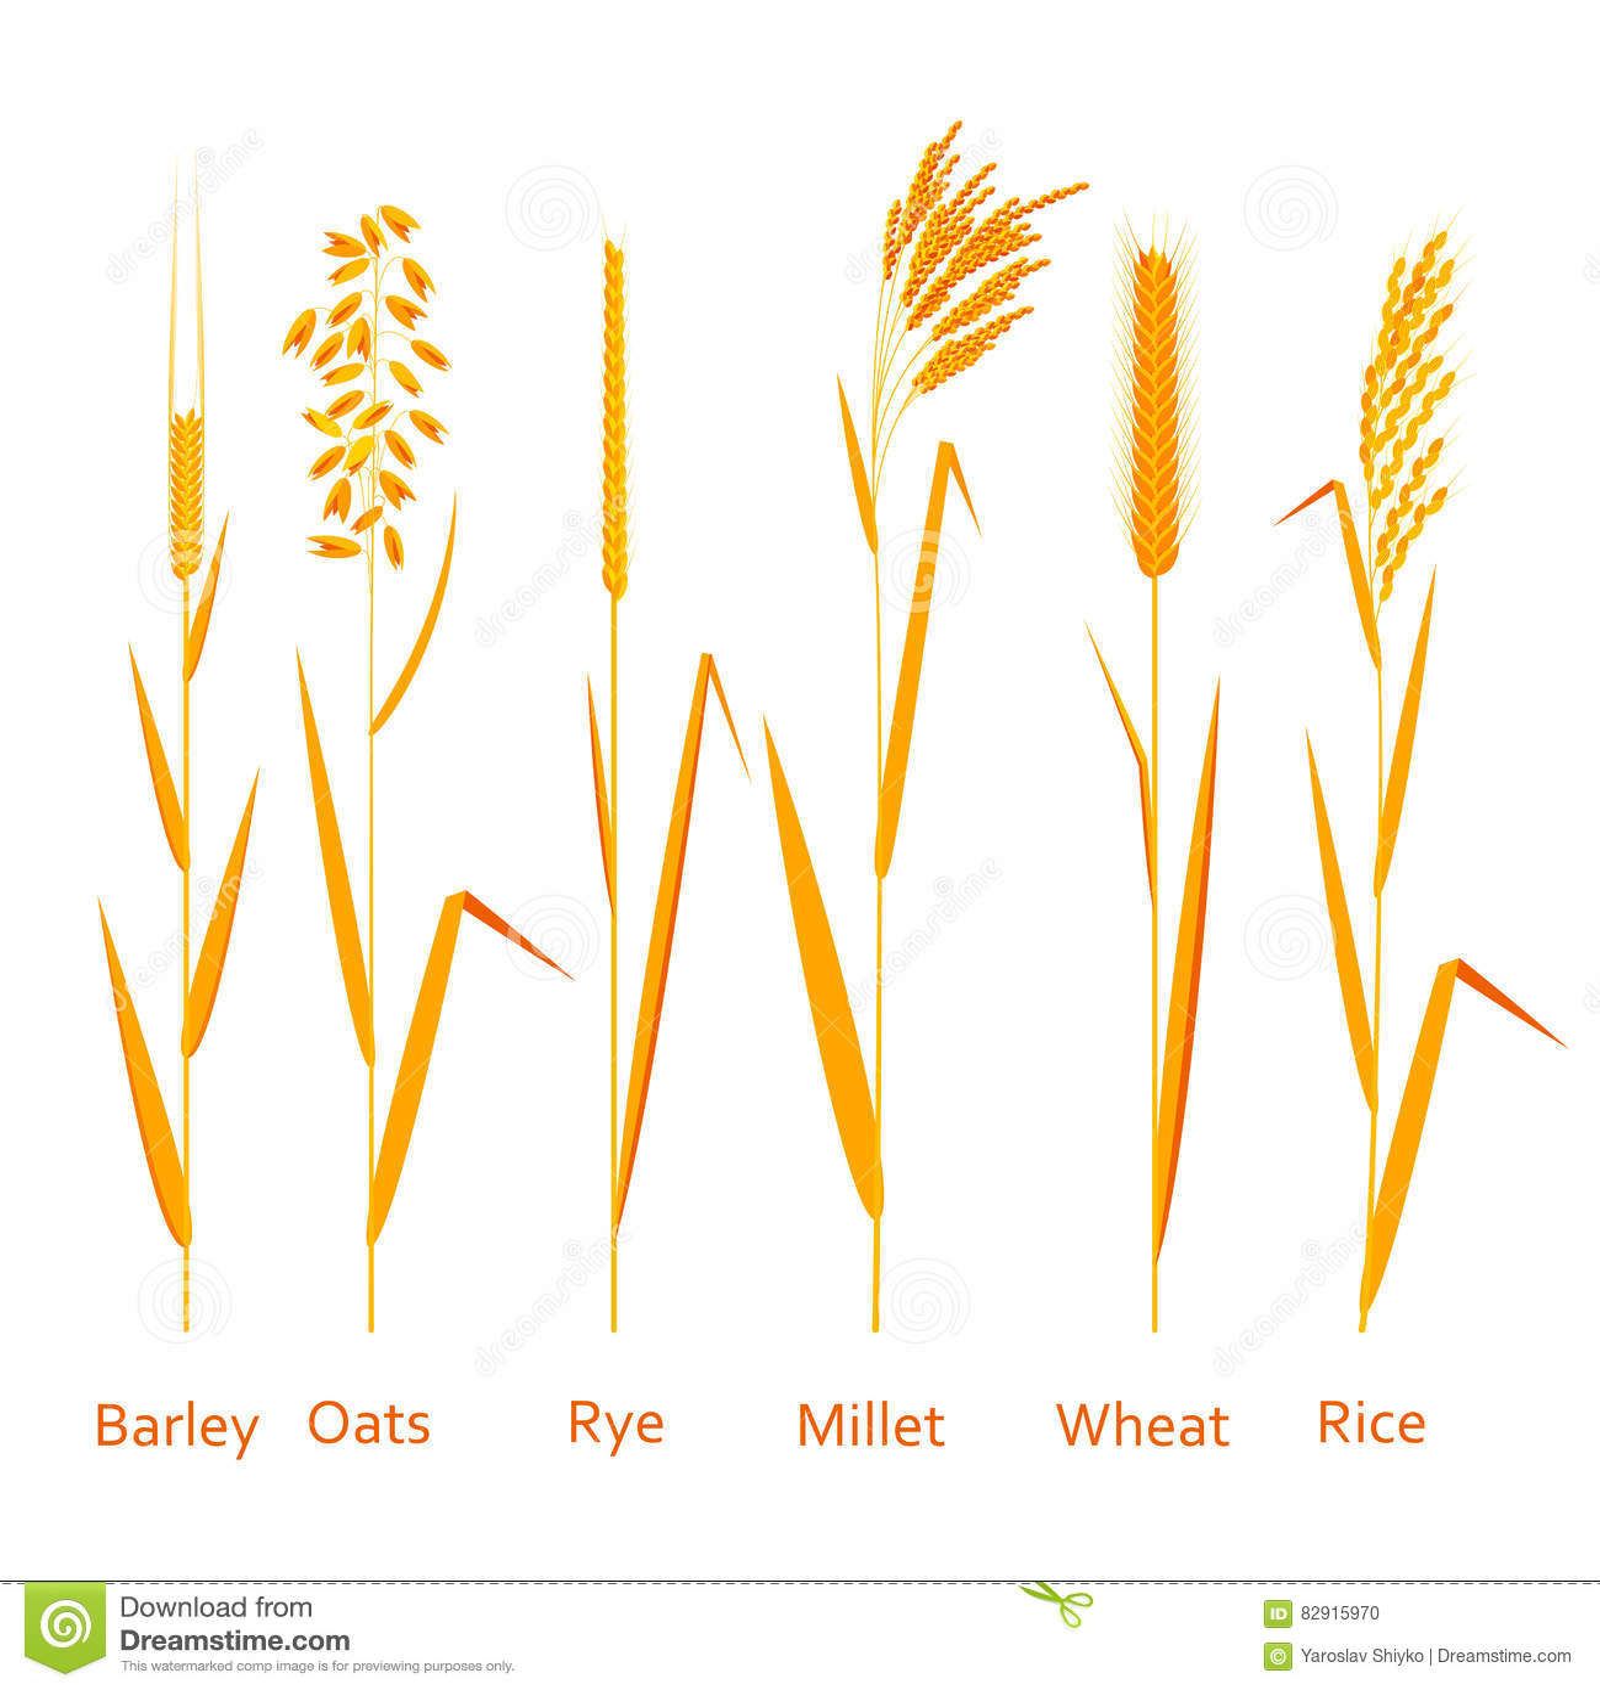 Image source plantsam com - Carbohydrates Cereals Colorful Illustration Plants Set Sources